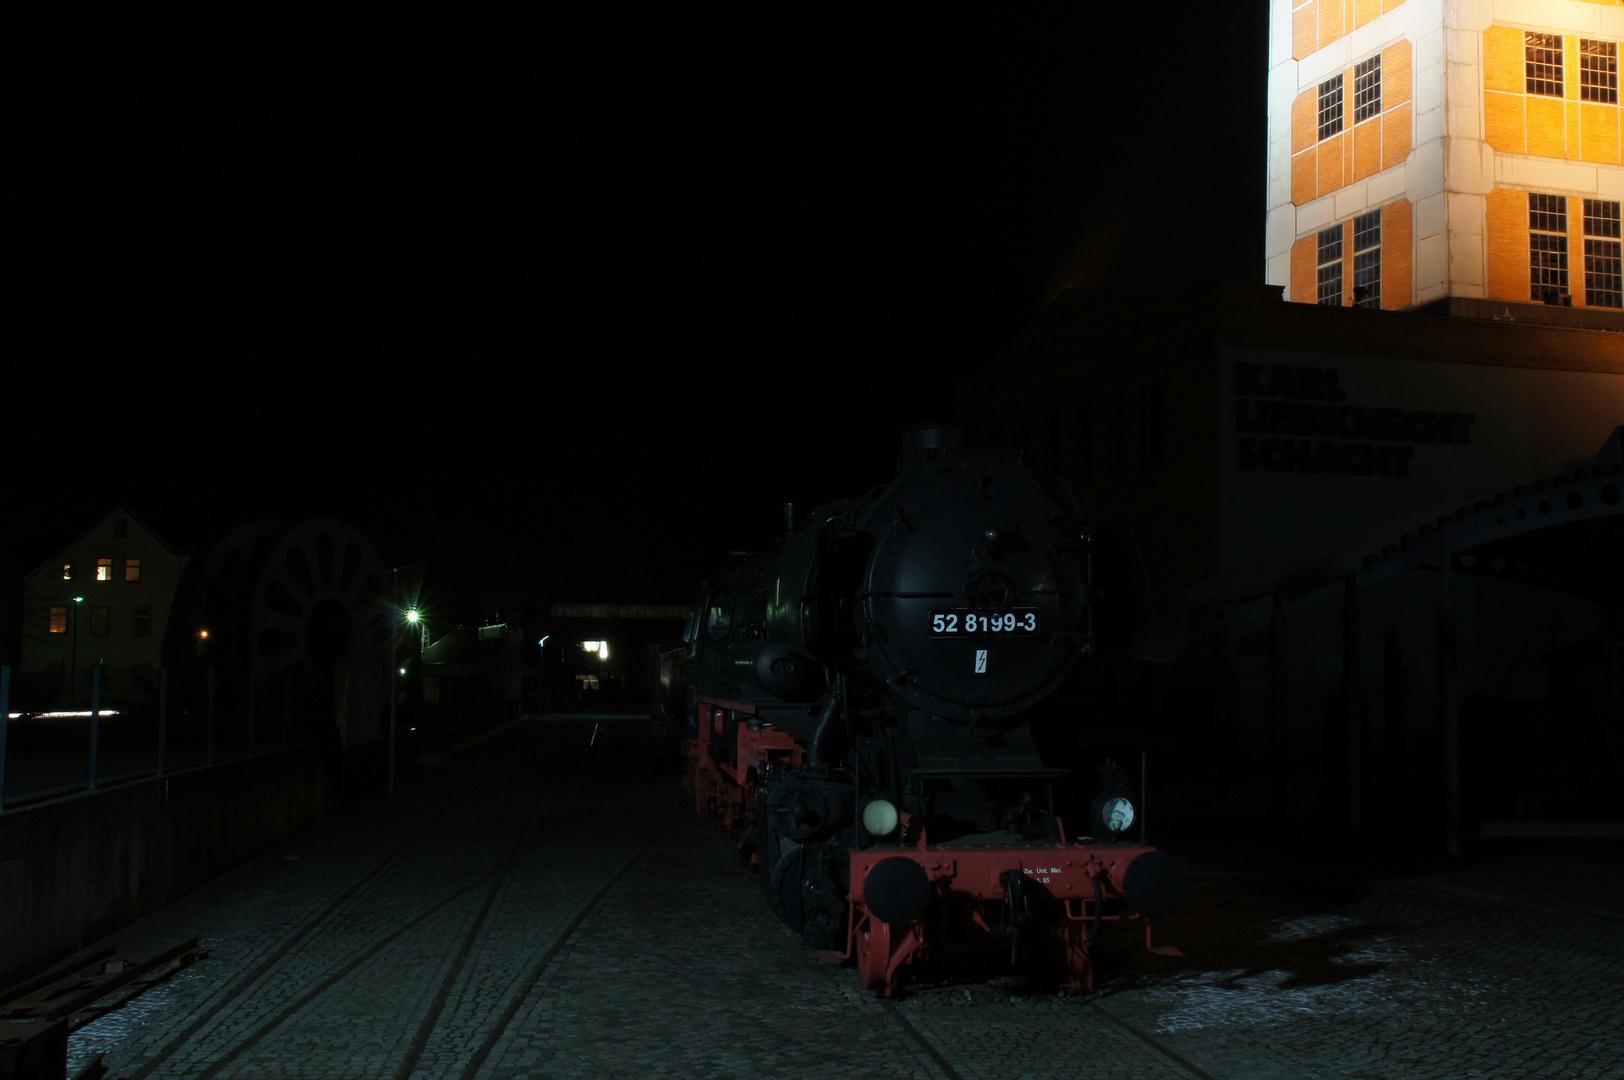 Bergbaumuseum in Oelsnitz